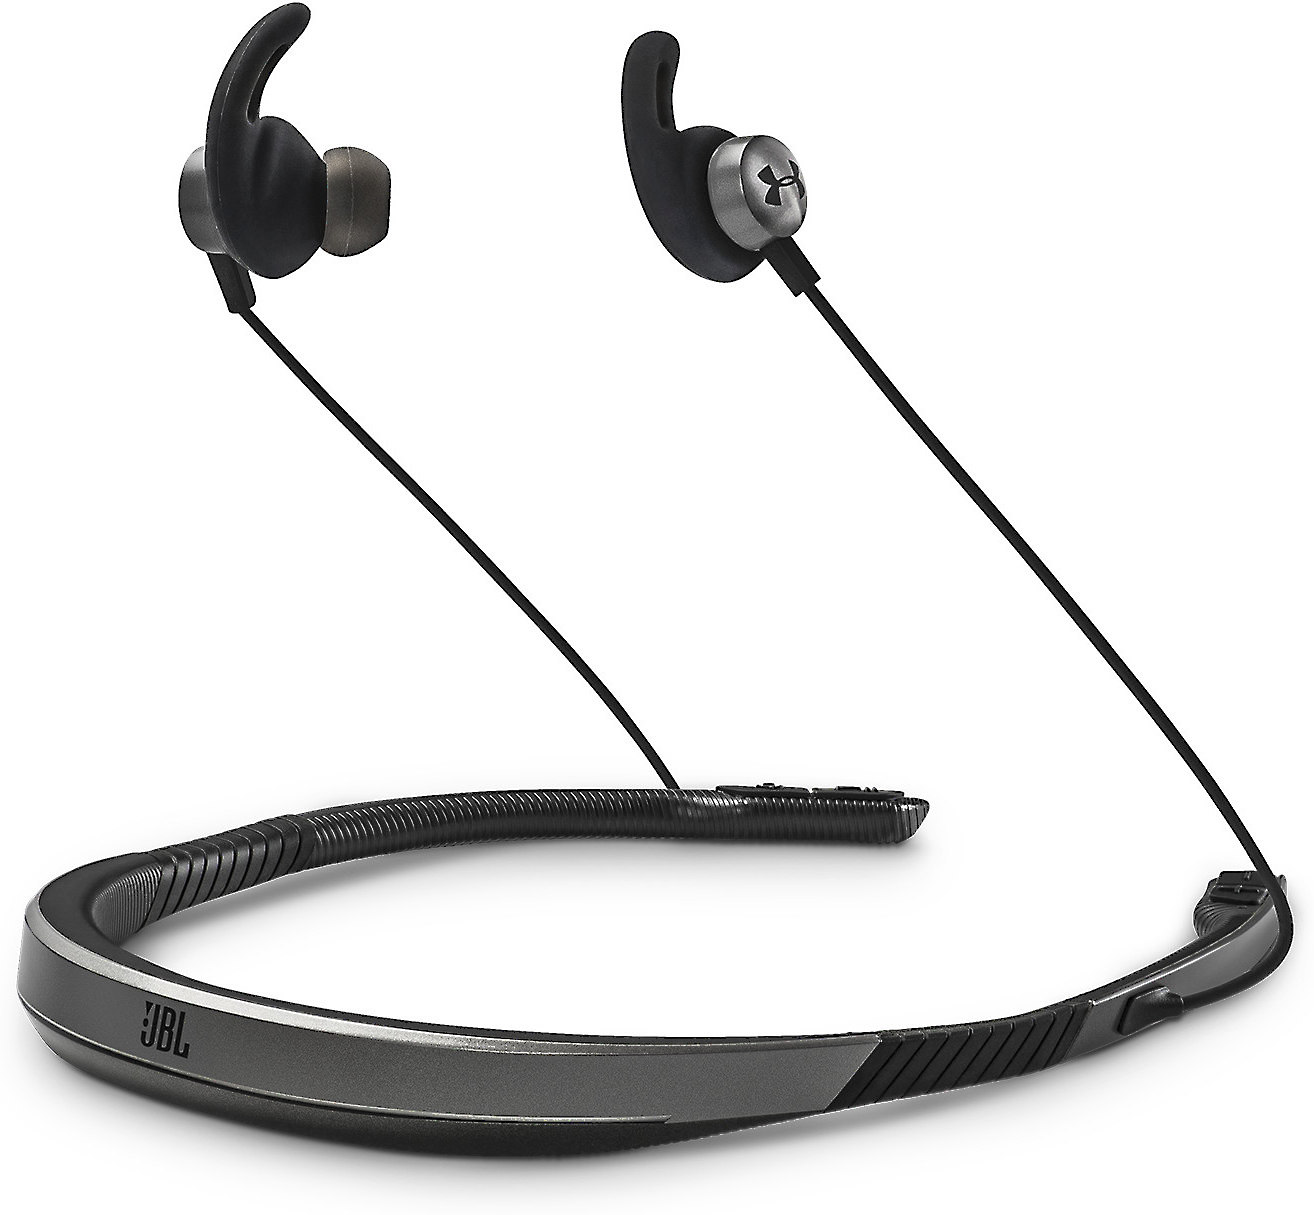 invención Pobreza extrema Amanecer  Under Armour® Sport Wireless Flex — Engineered by JBL Bluetooth® neckband  sports headphones at Crutchfield